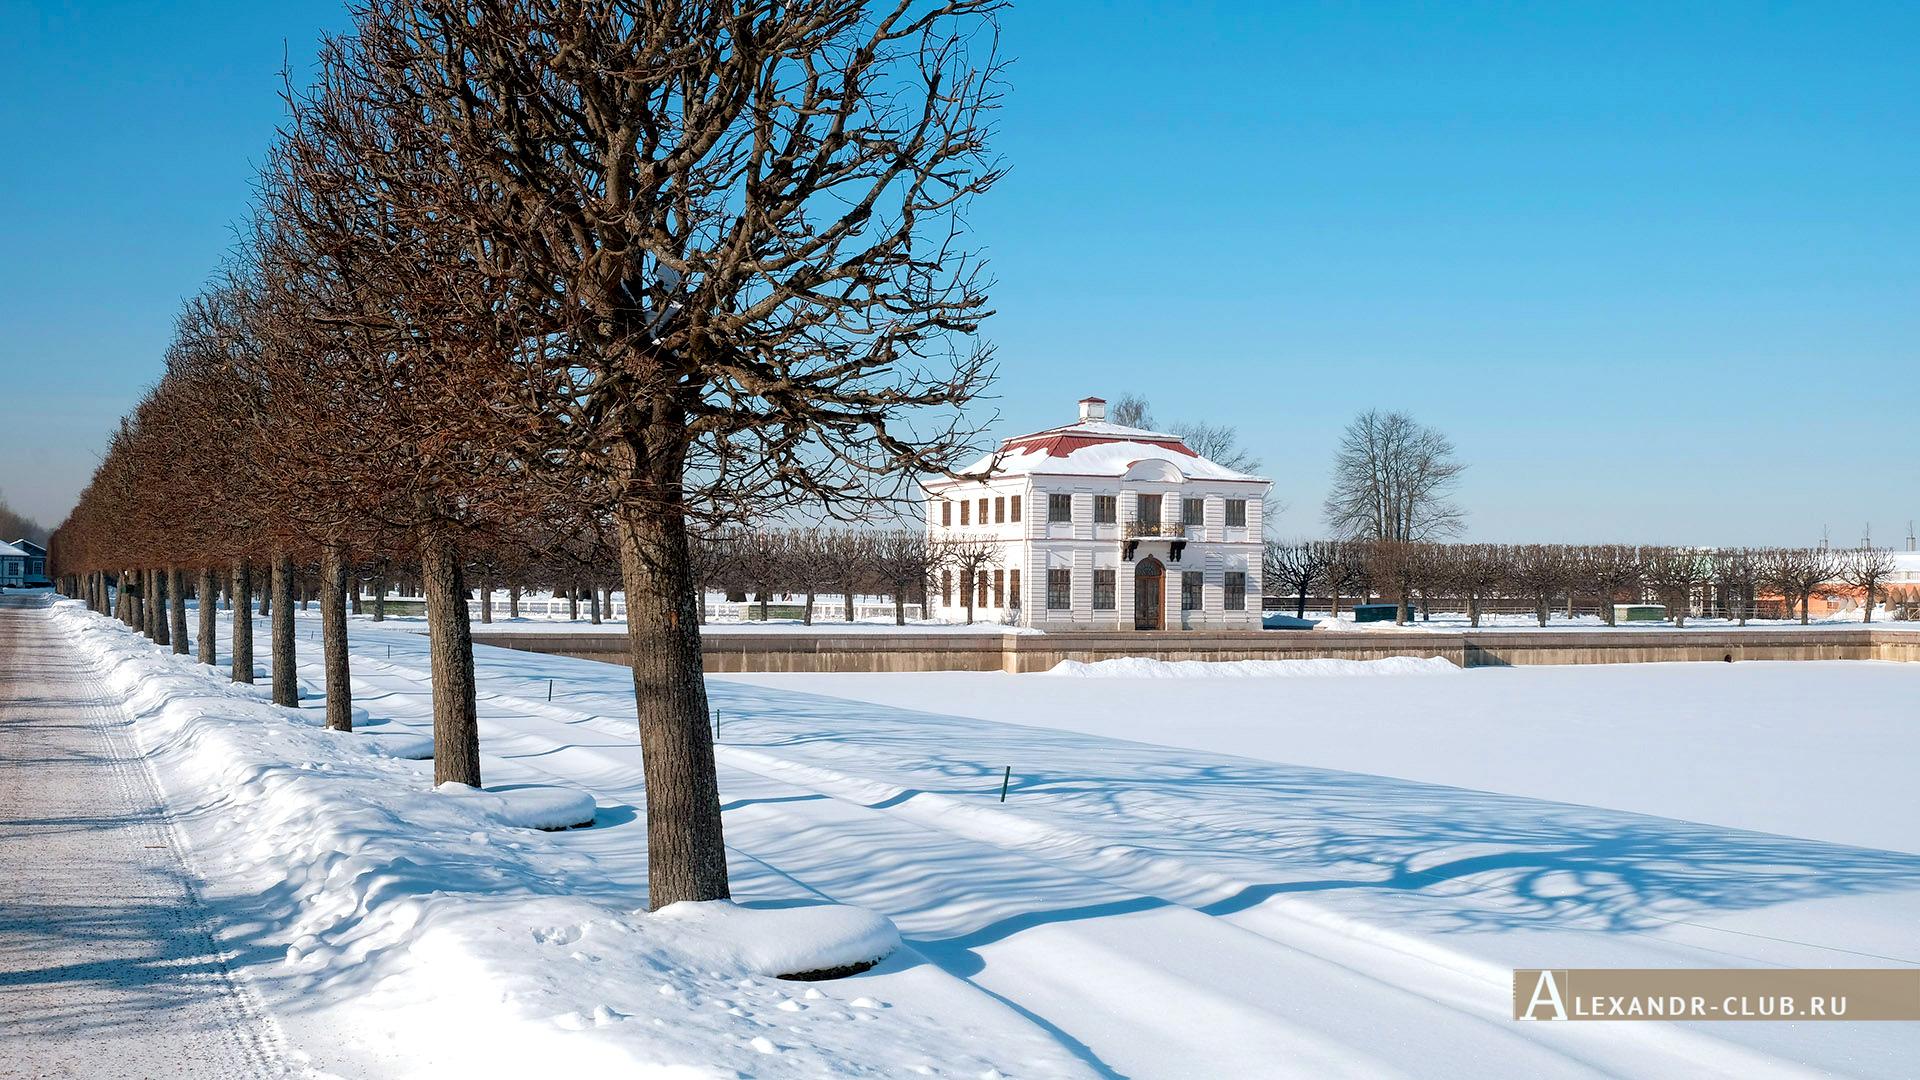 Петергоф, зима, Нижний парк, Марлинский пруд и дворец Марли – 2